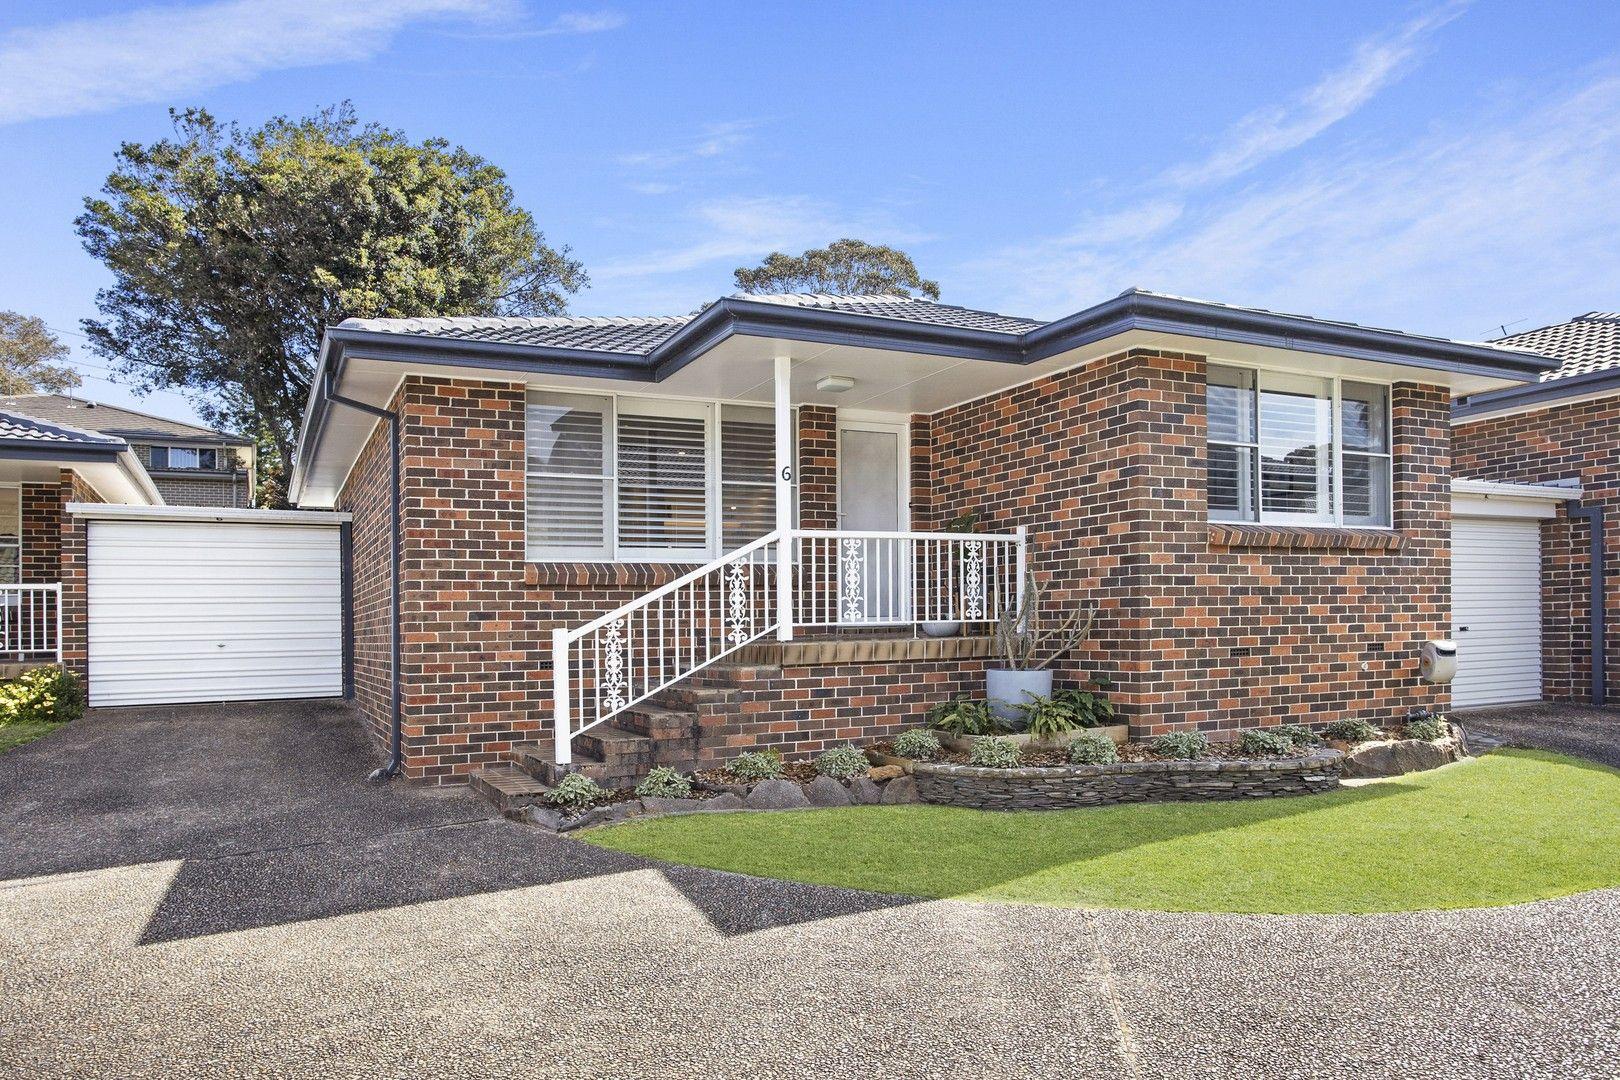 6/78 Hotham  Road, Gymea NSW 2227, Image 0